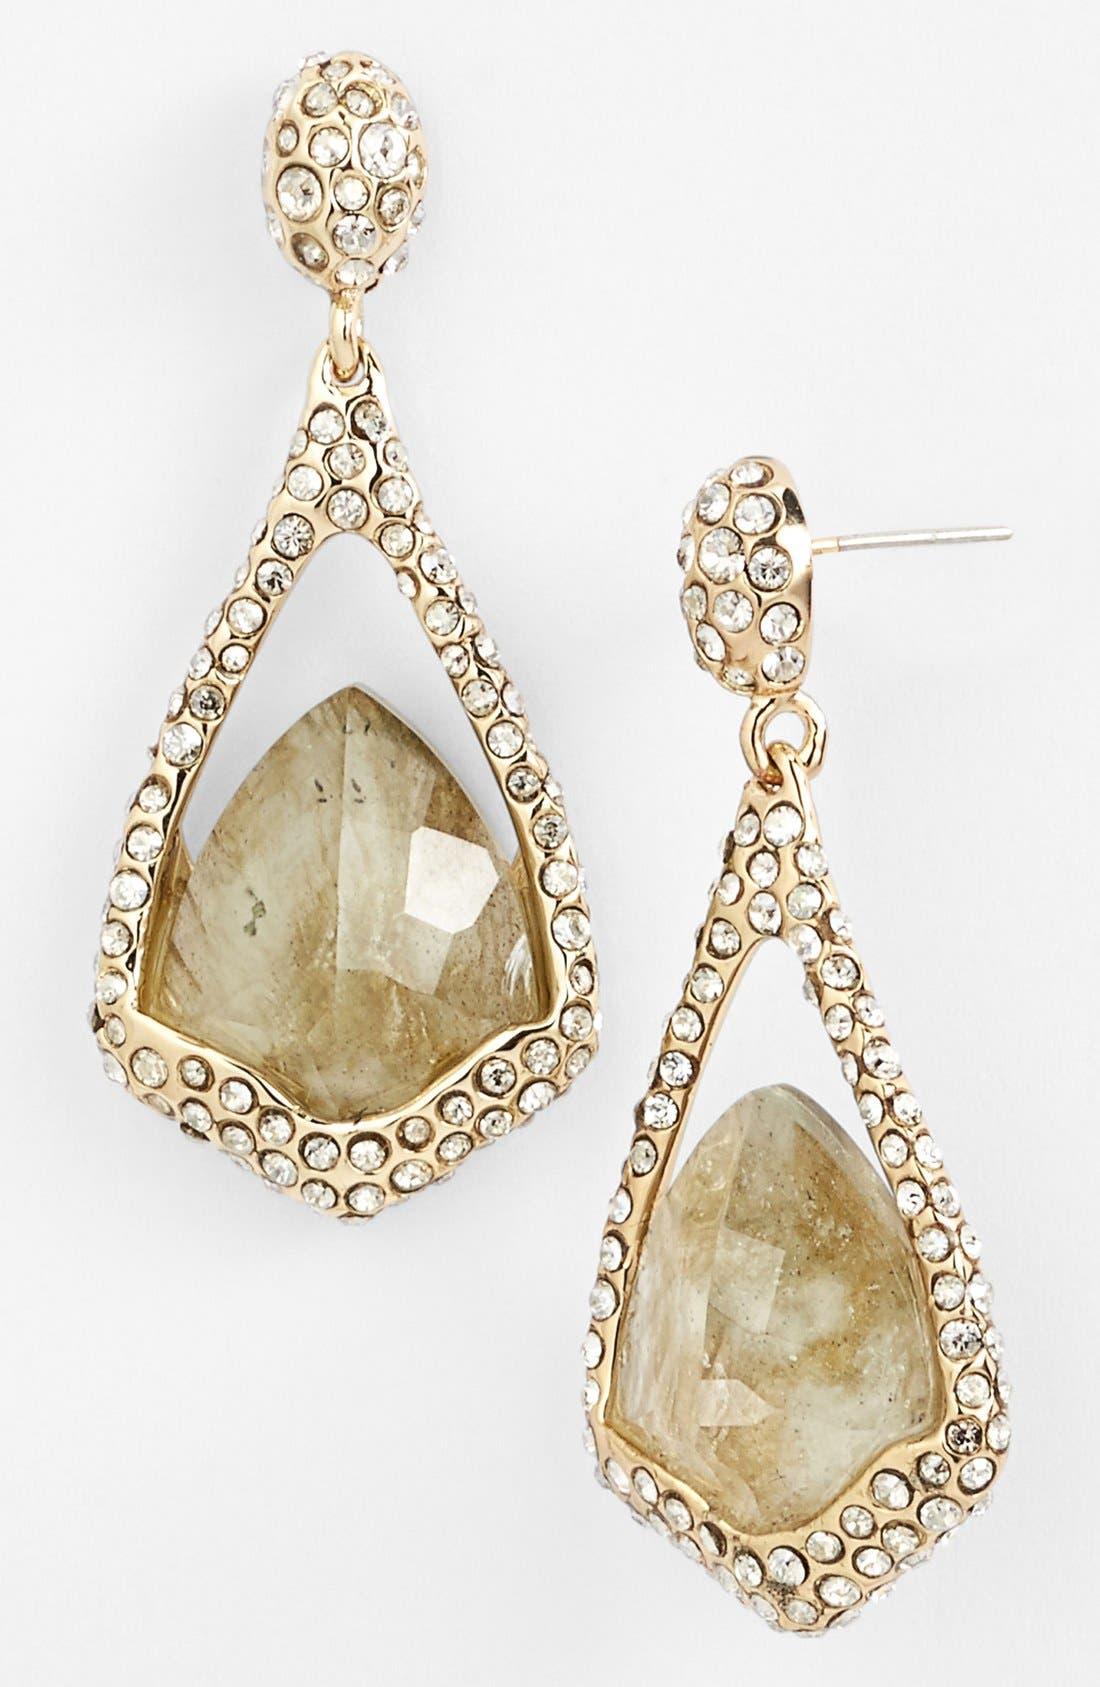 Alternate Image 1 Selected - Alexis Bittar 'Miss Havisham' Doublet Drop Earrings